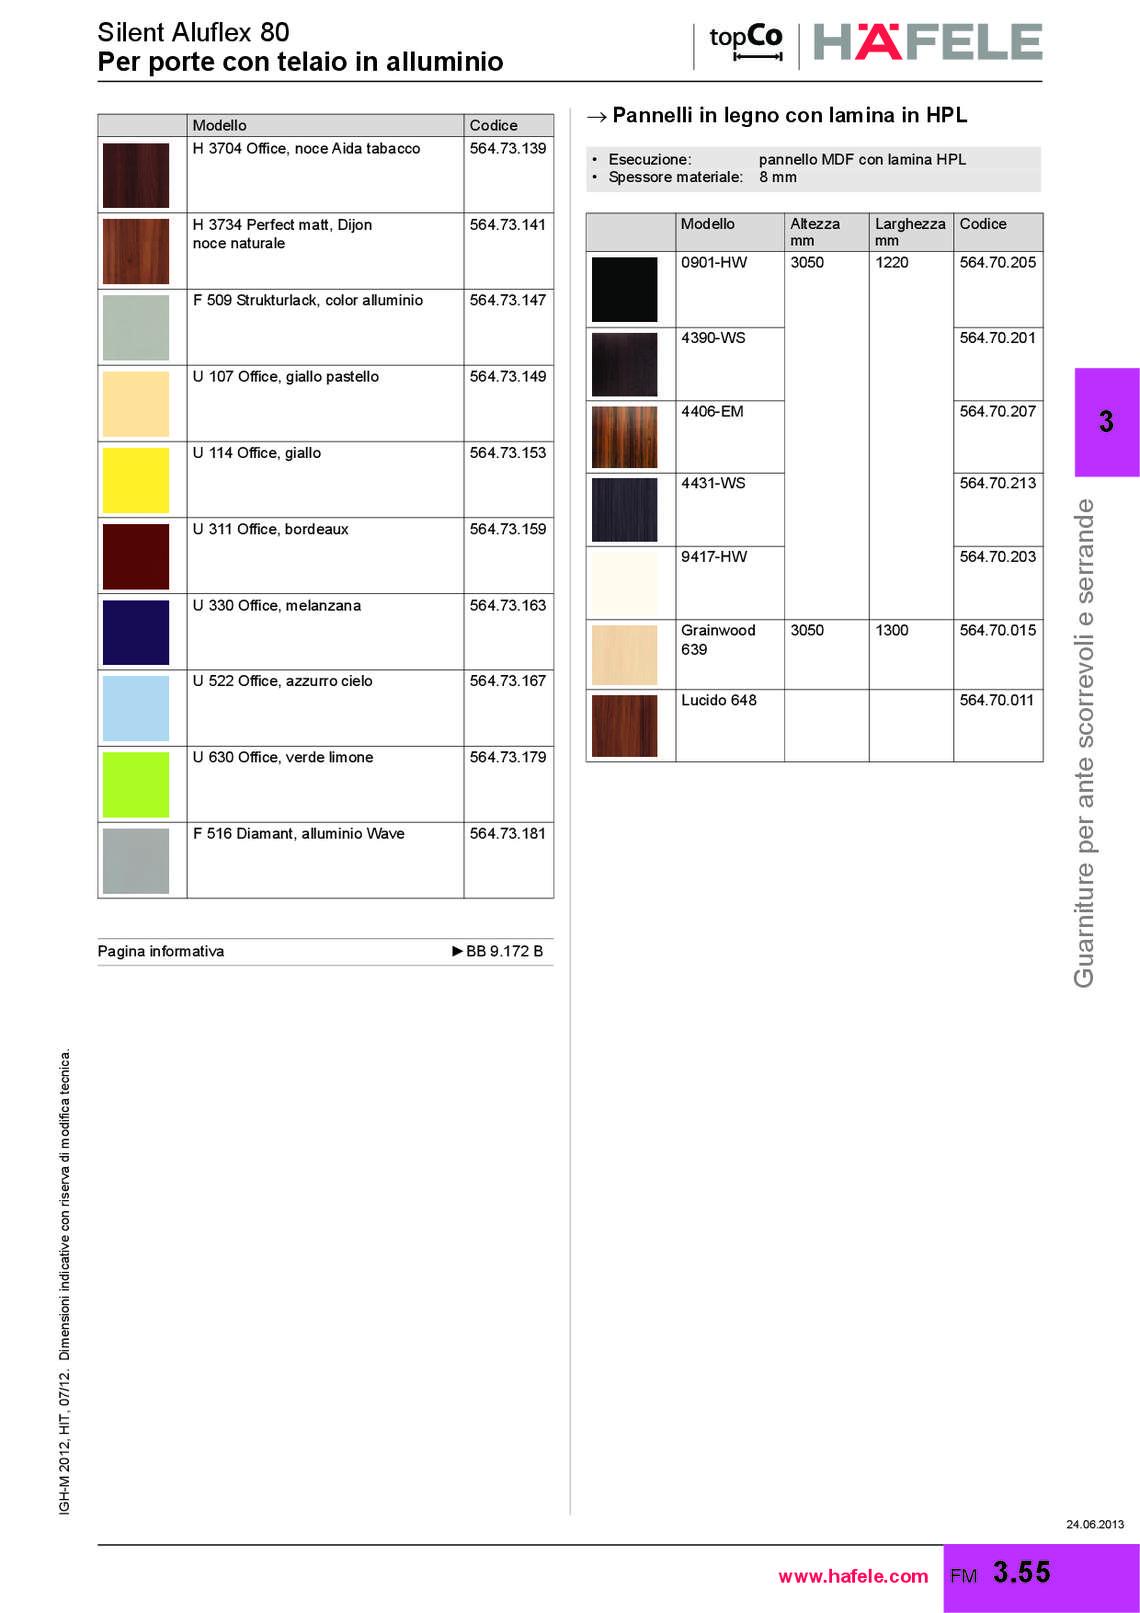 hafele-prodotti-su-misura_81_070.jpg